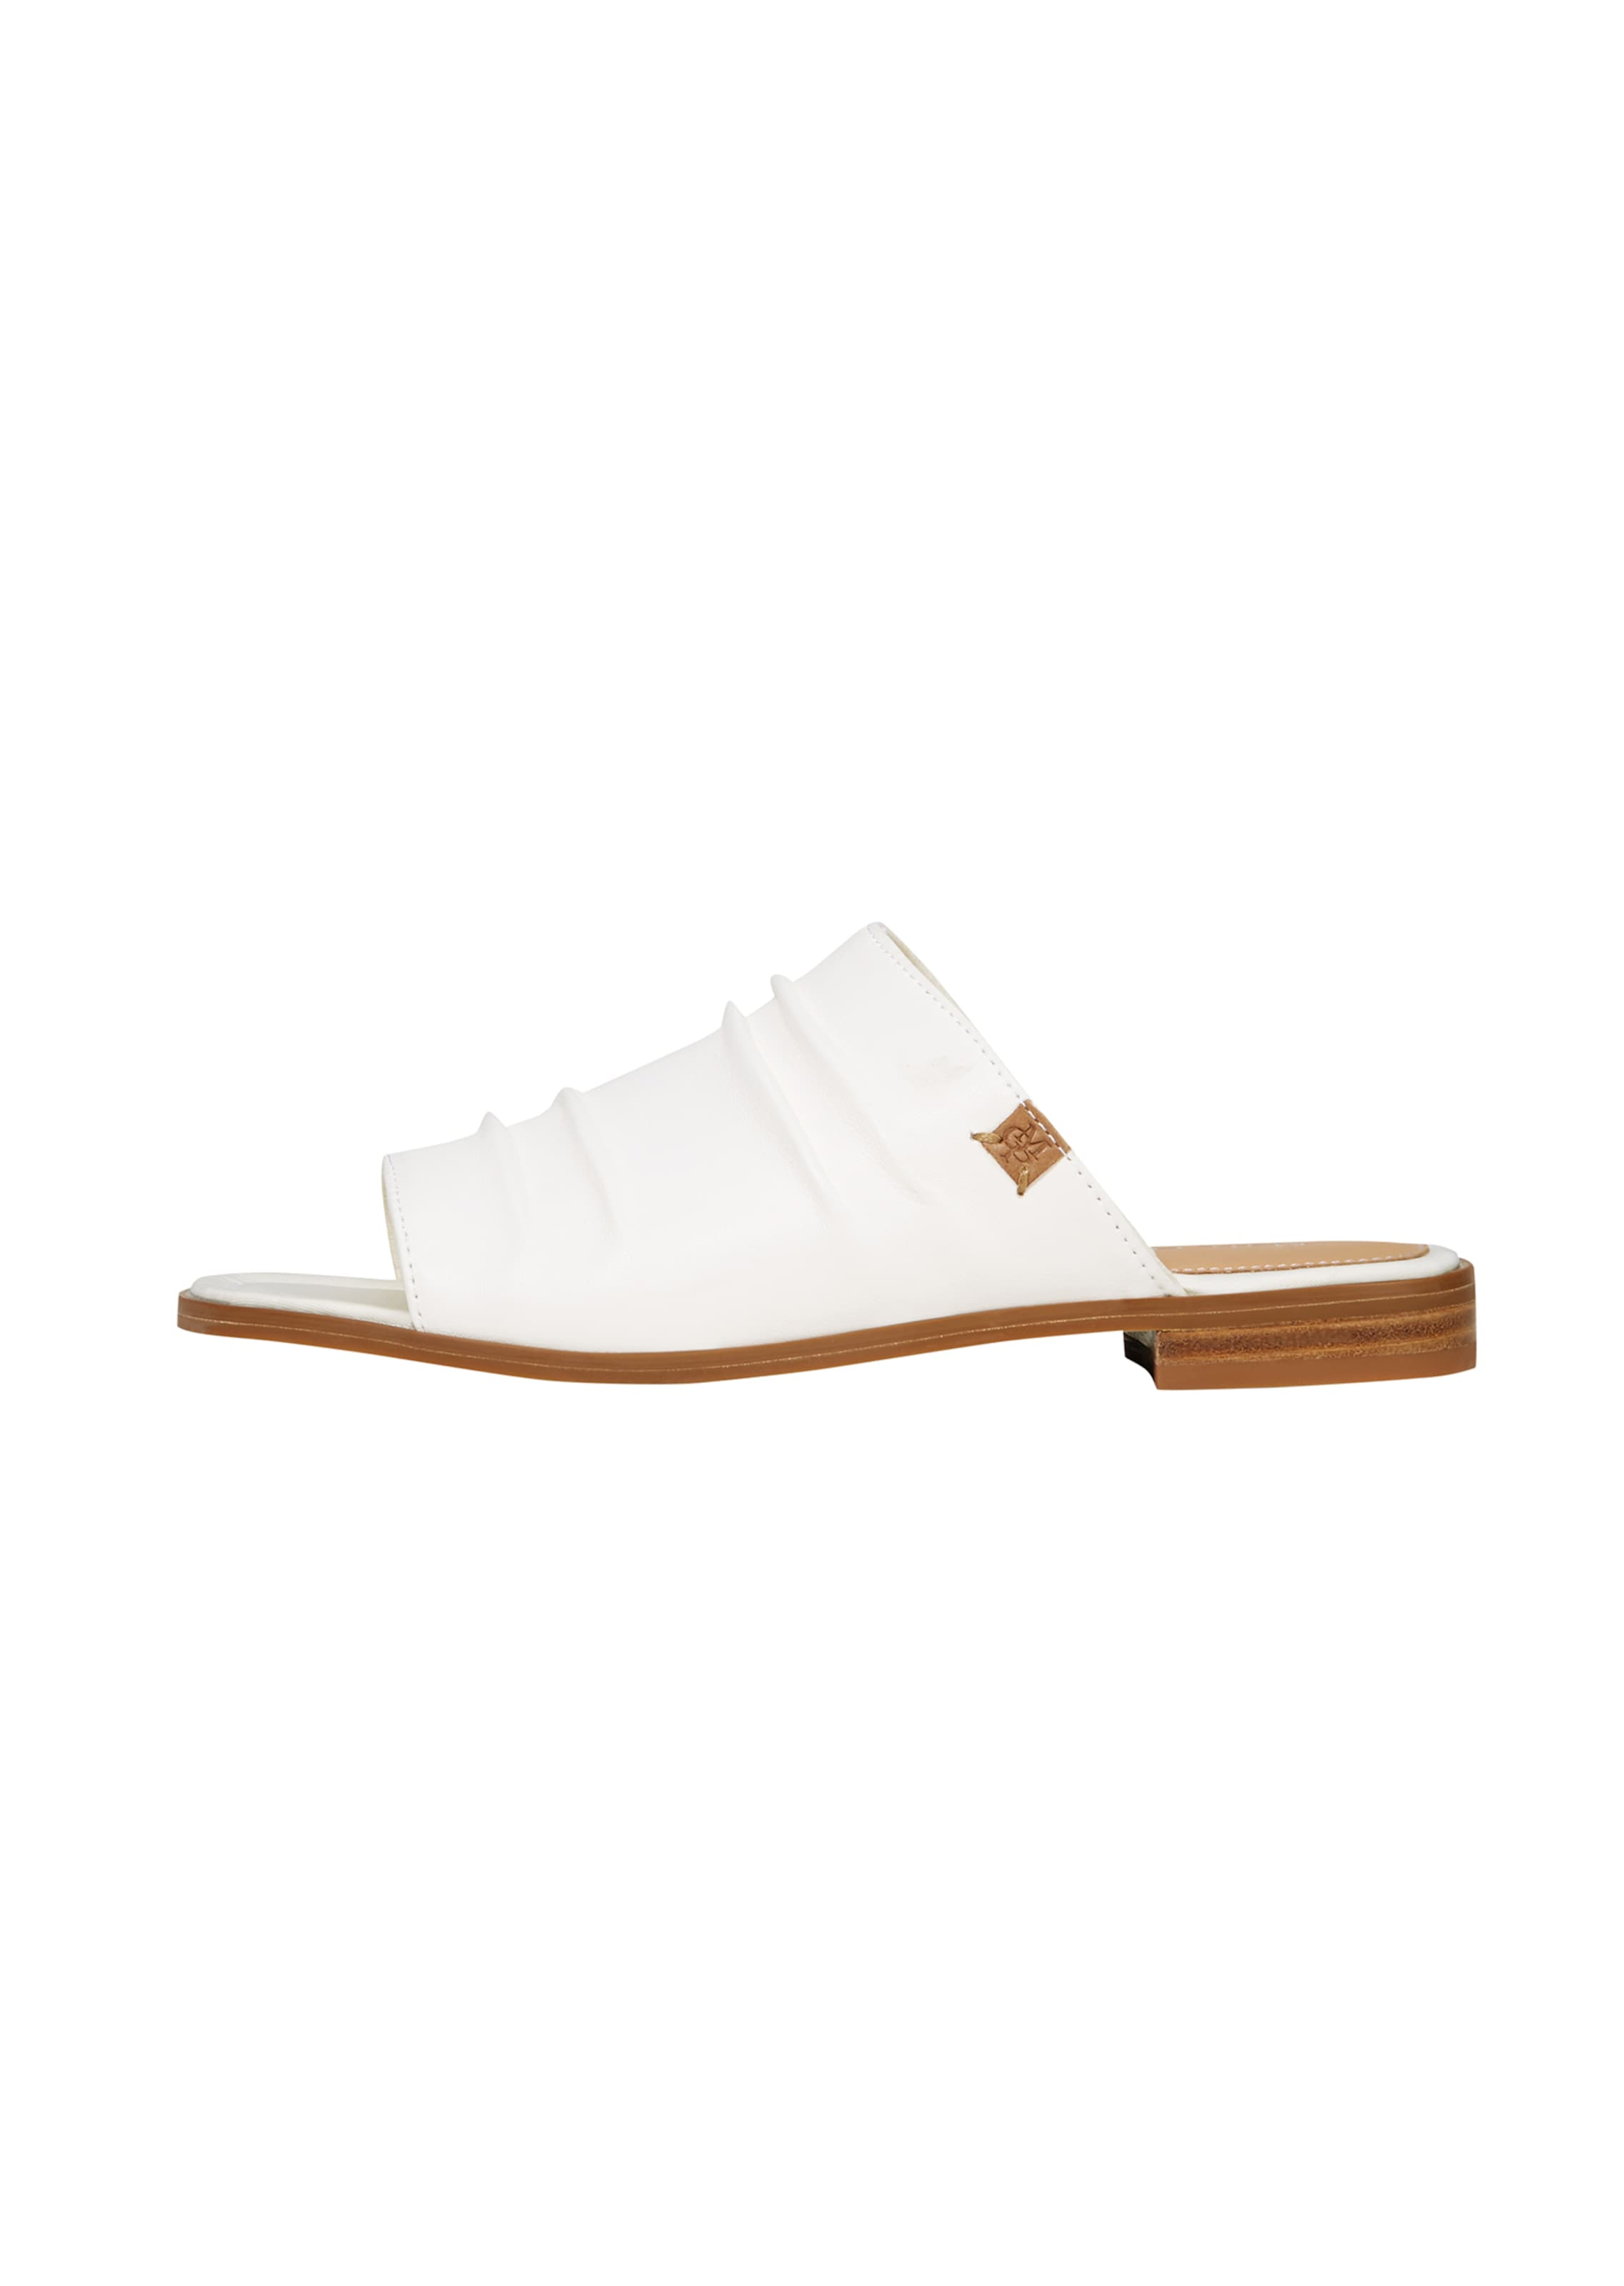 Marc O Polo Pantolette Günstige und langlebige Schuhe